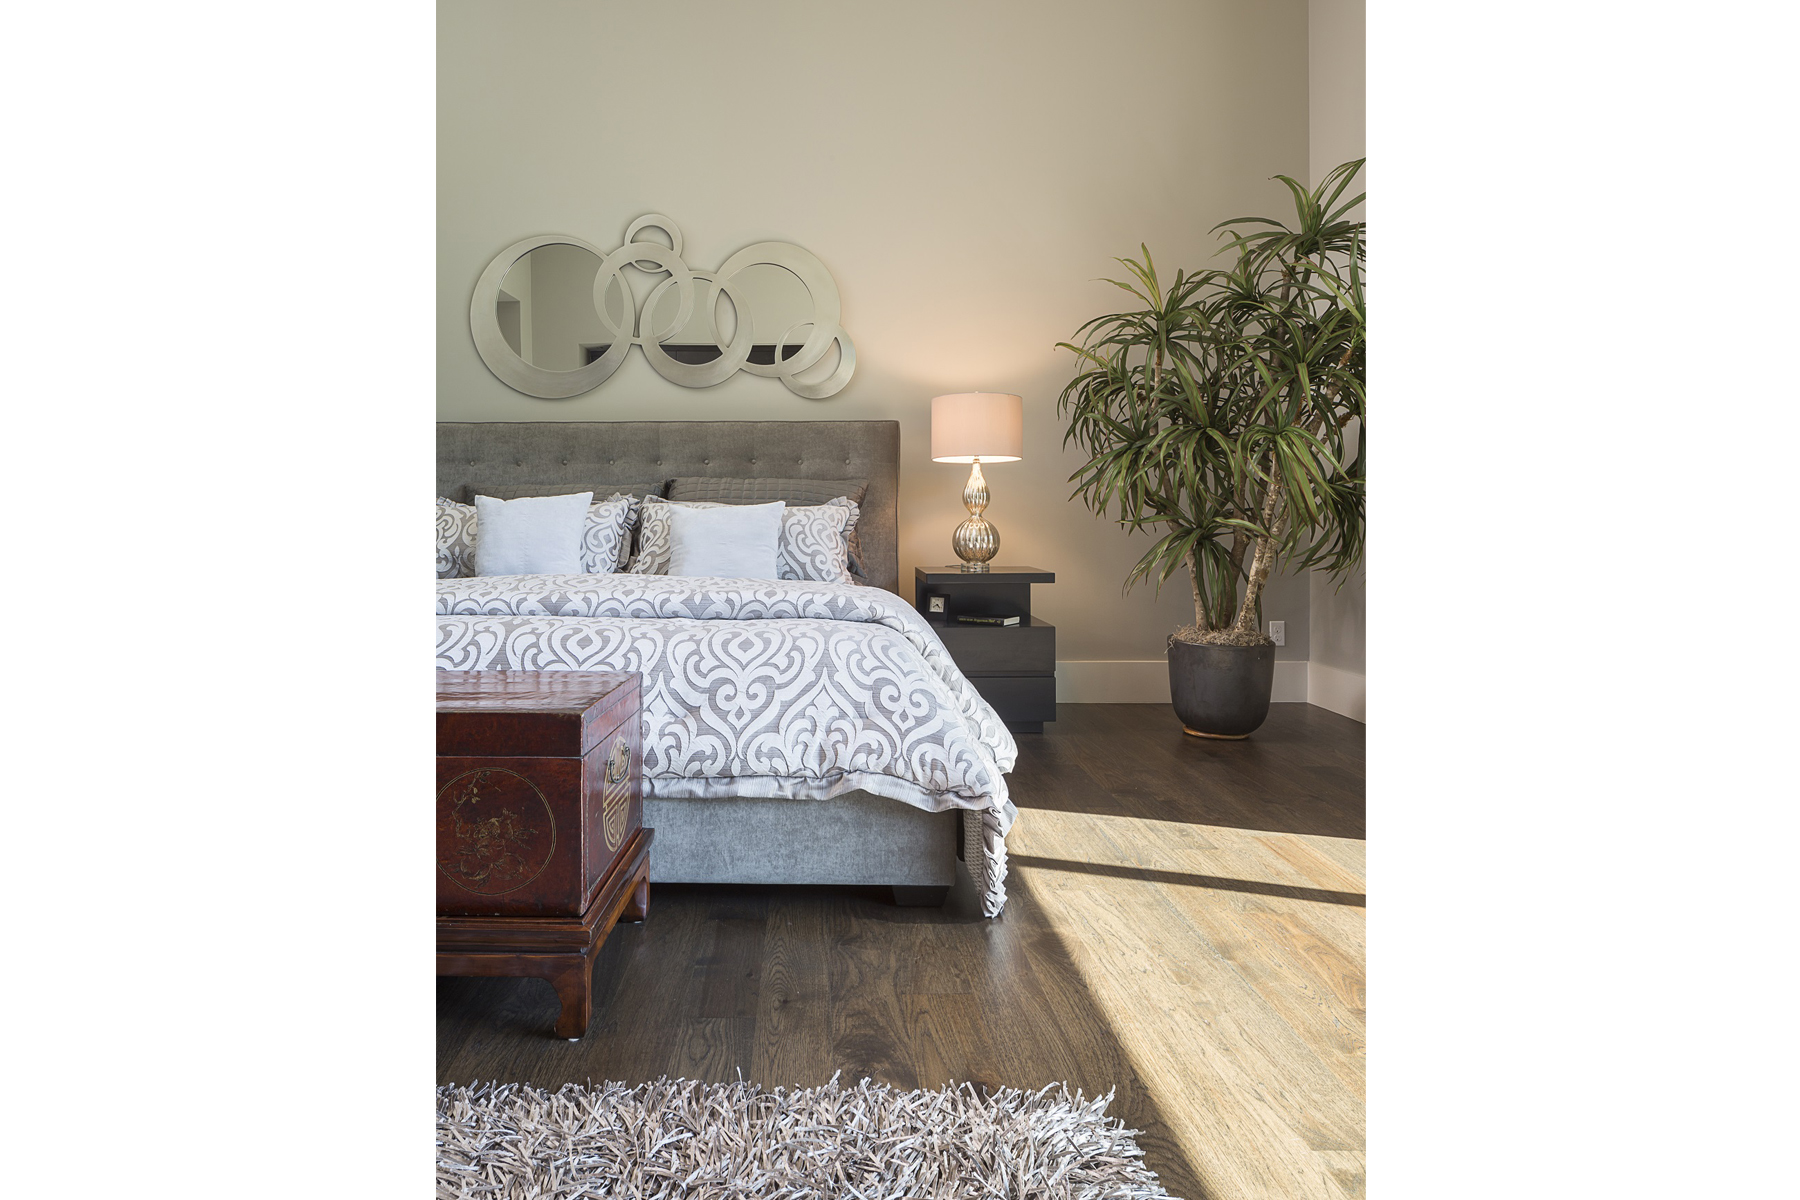 StratfordResidence-20-master-bedroom